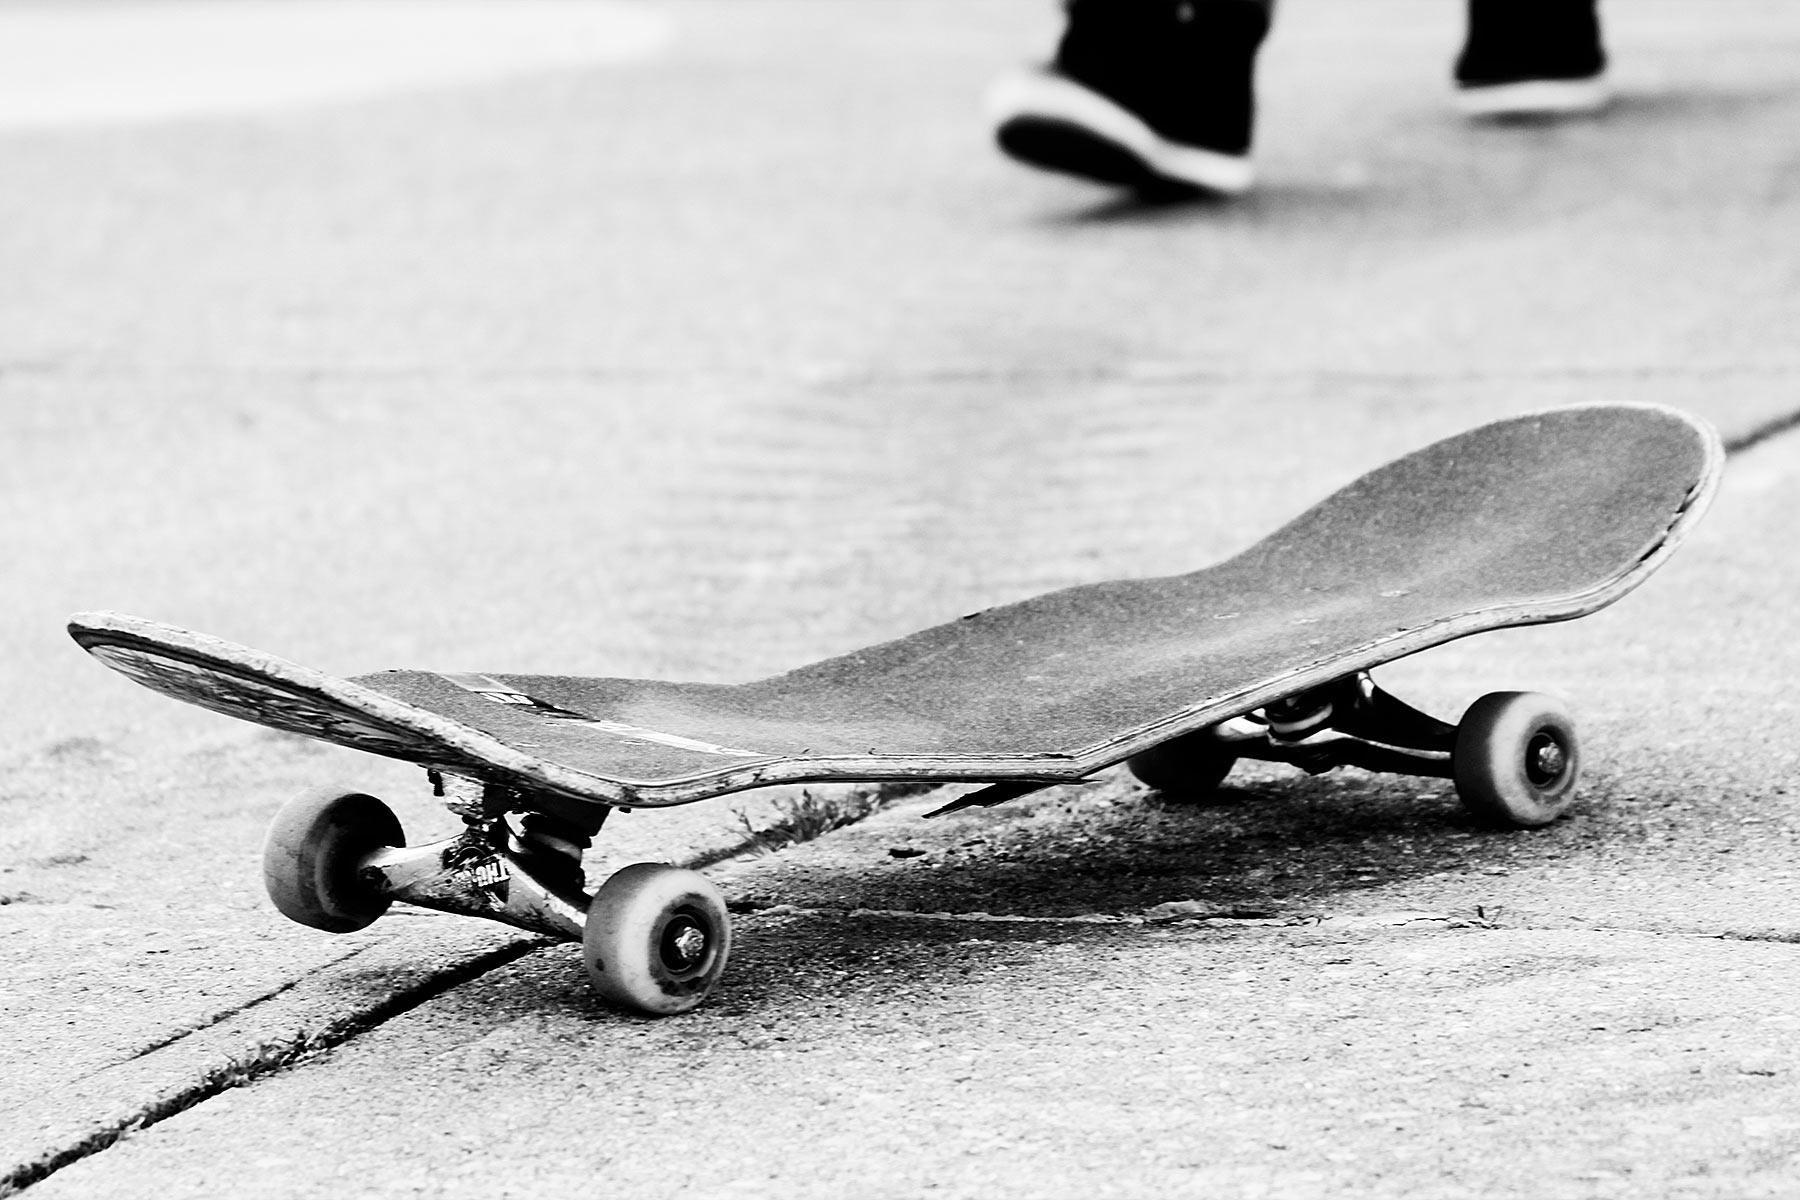 sned's broken skateboard